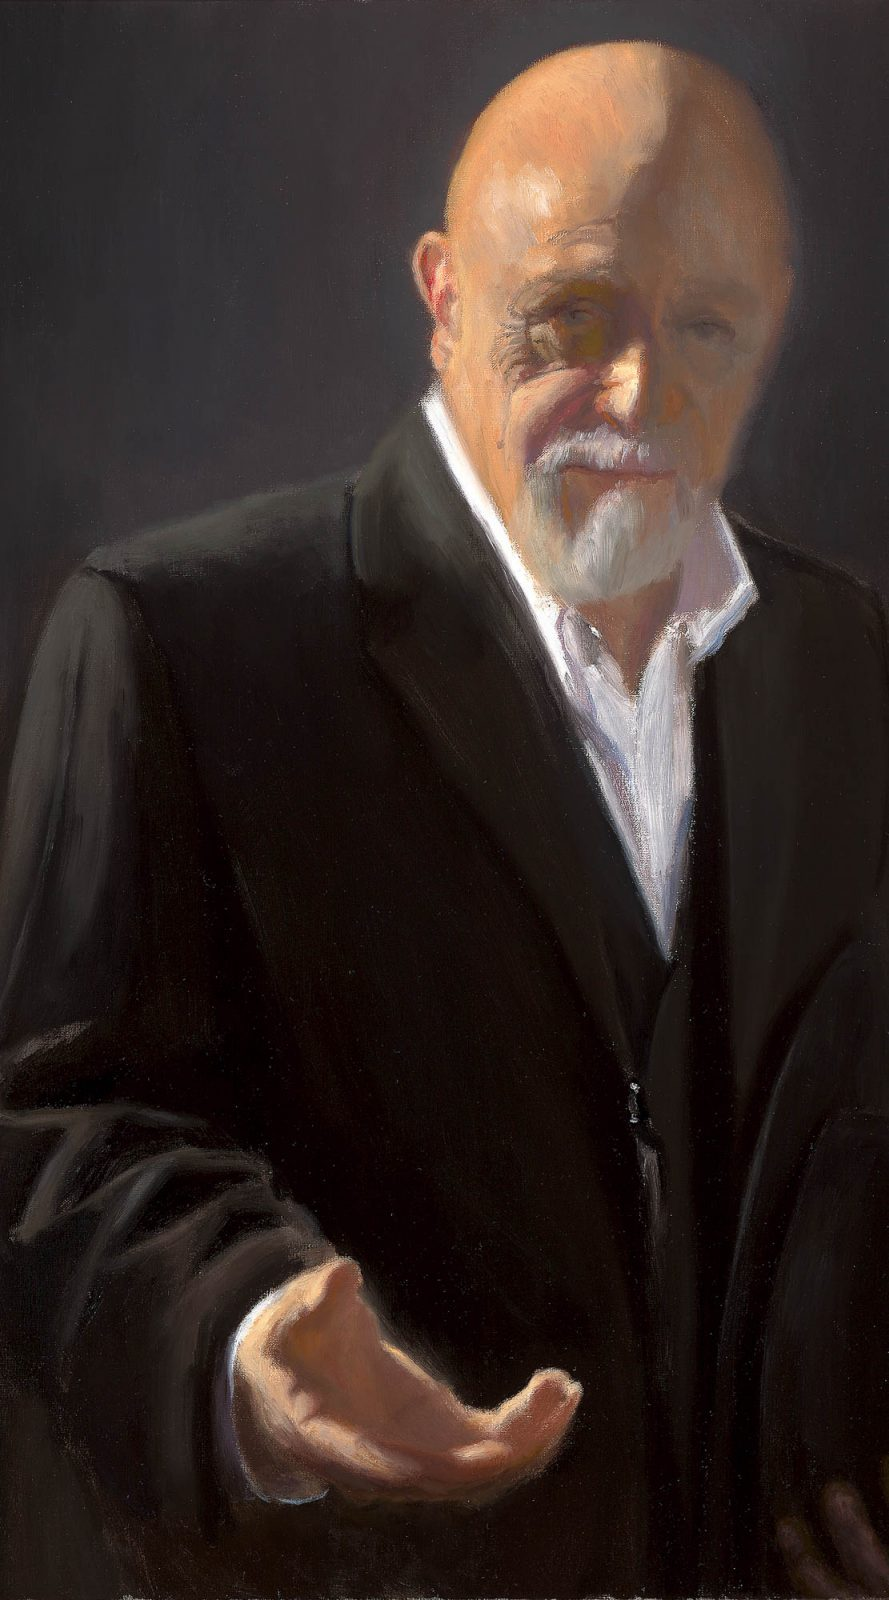 Paul Chizik - Portrait of a Gentleman. Oil on Linen 29 x 19 inches